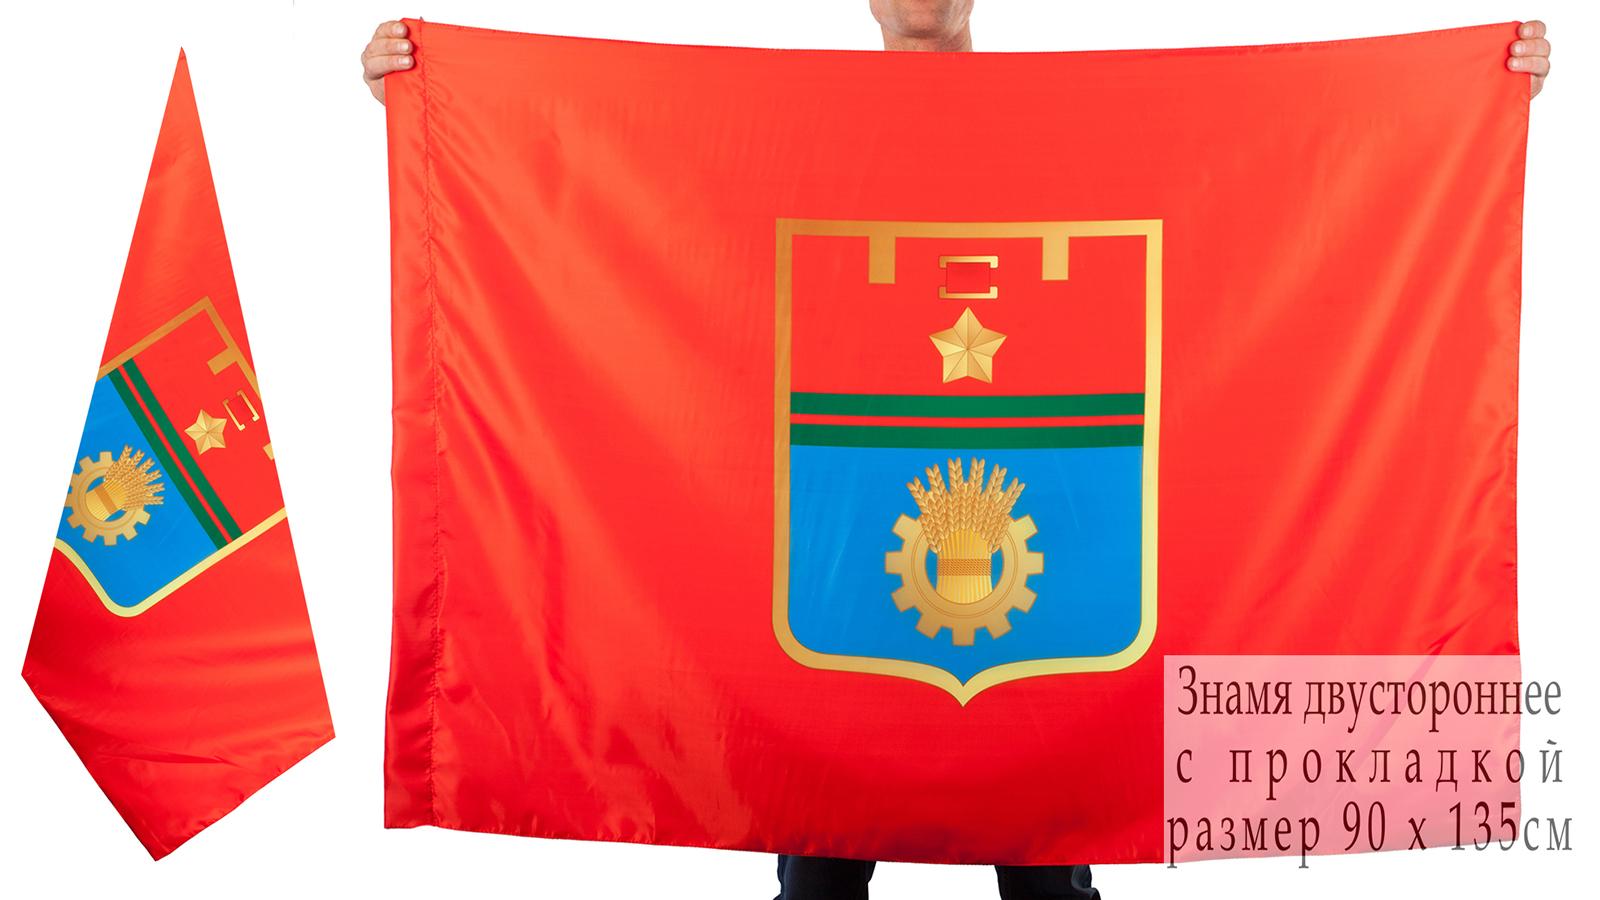 Двухсторонний флаг Волгограда